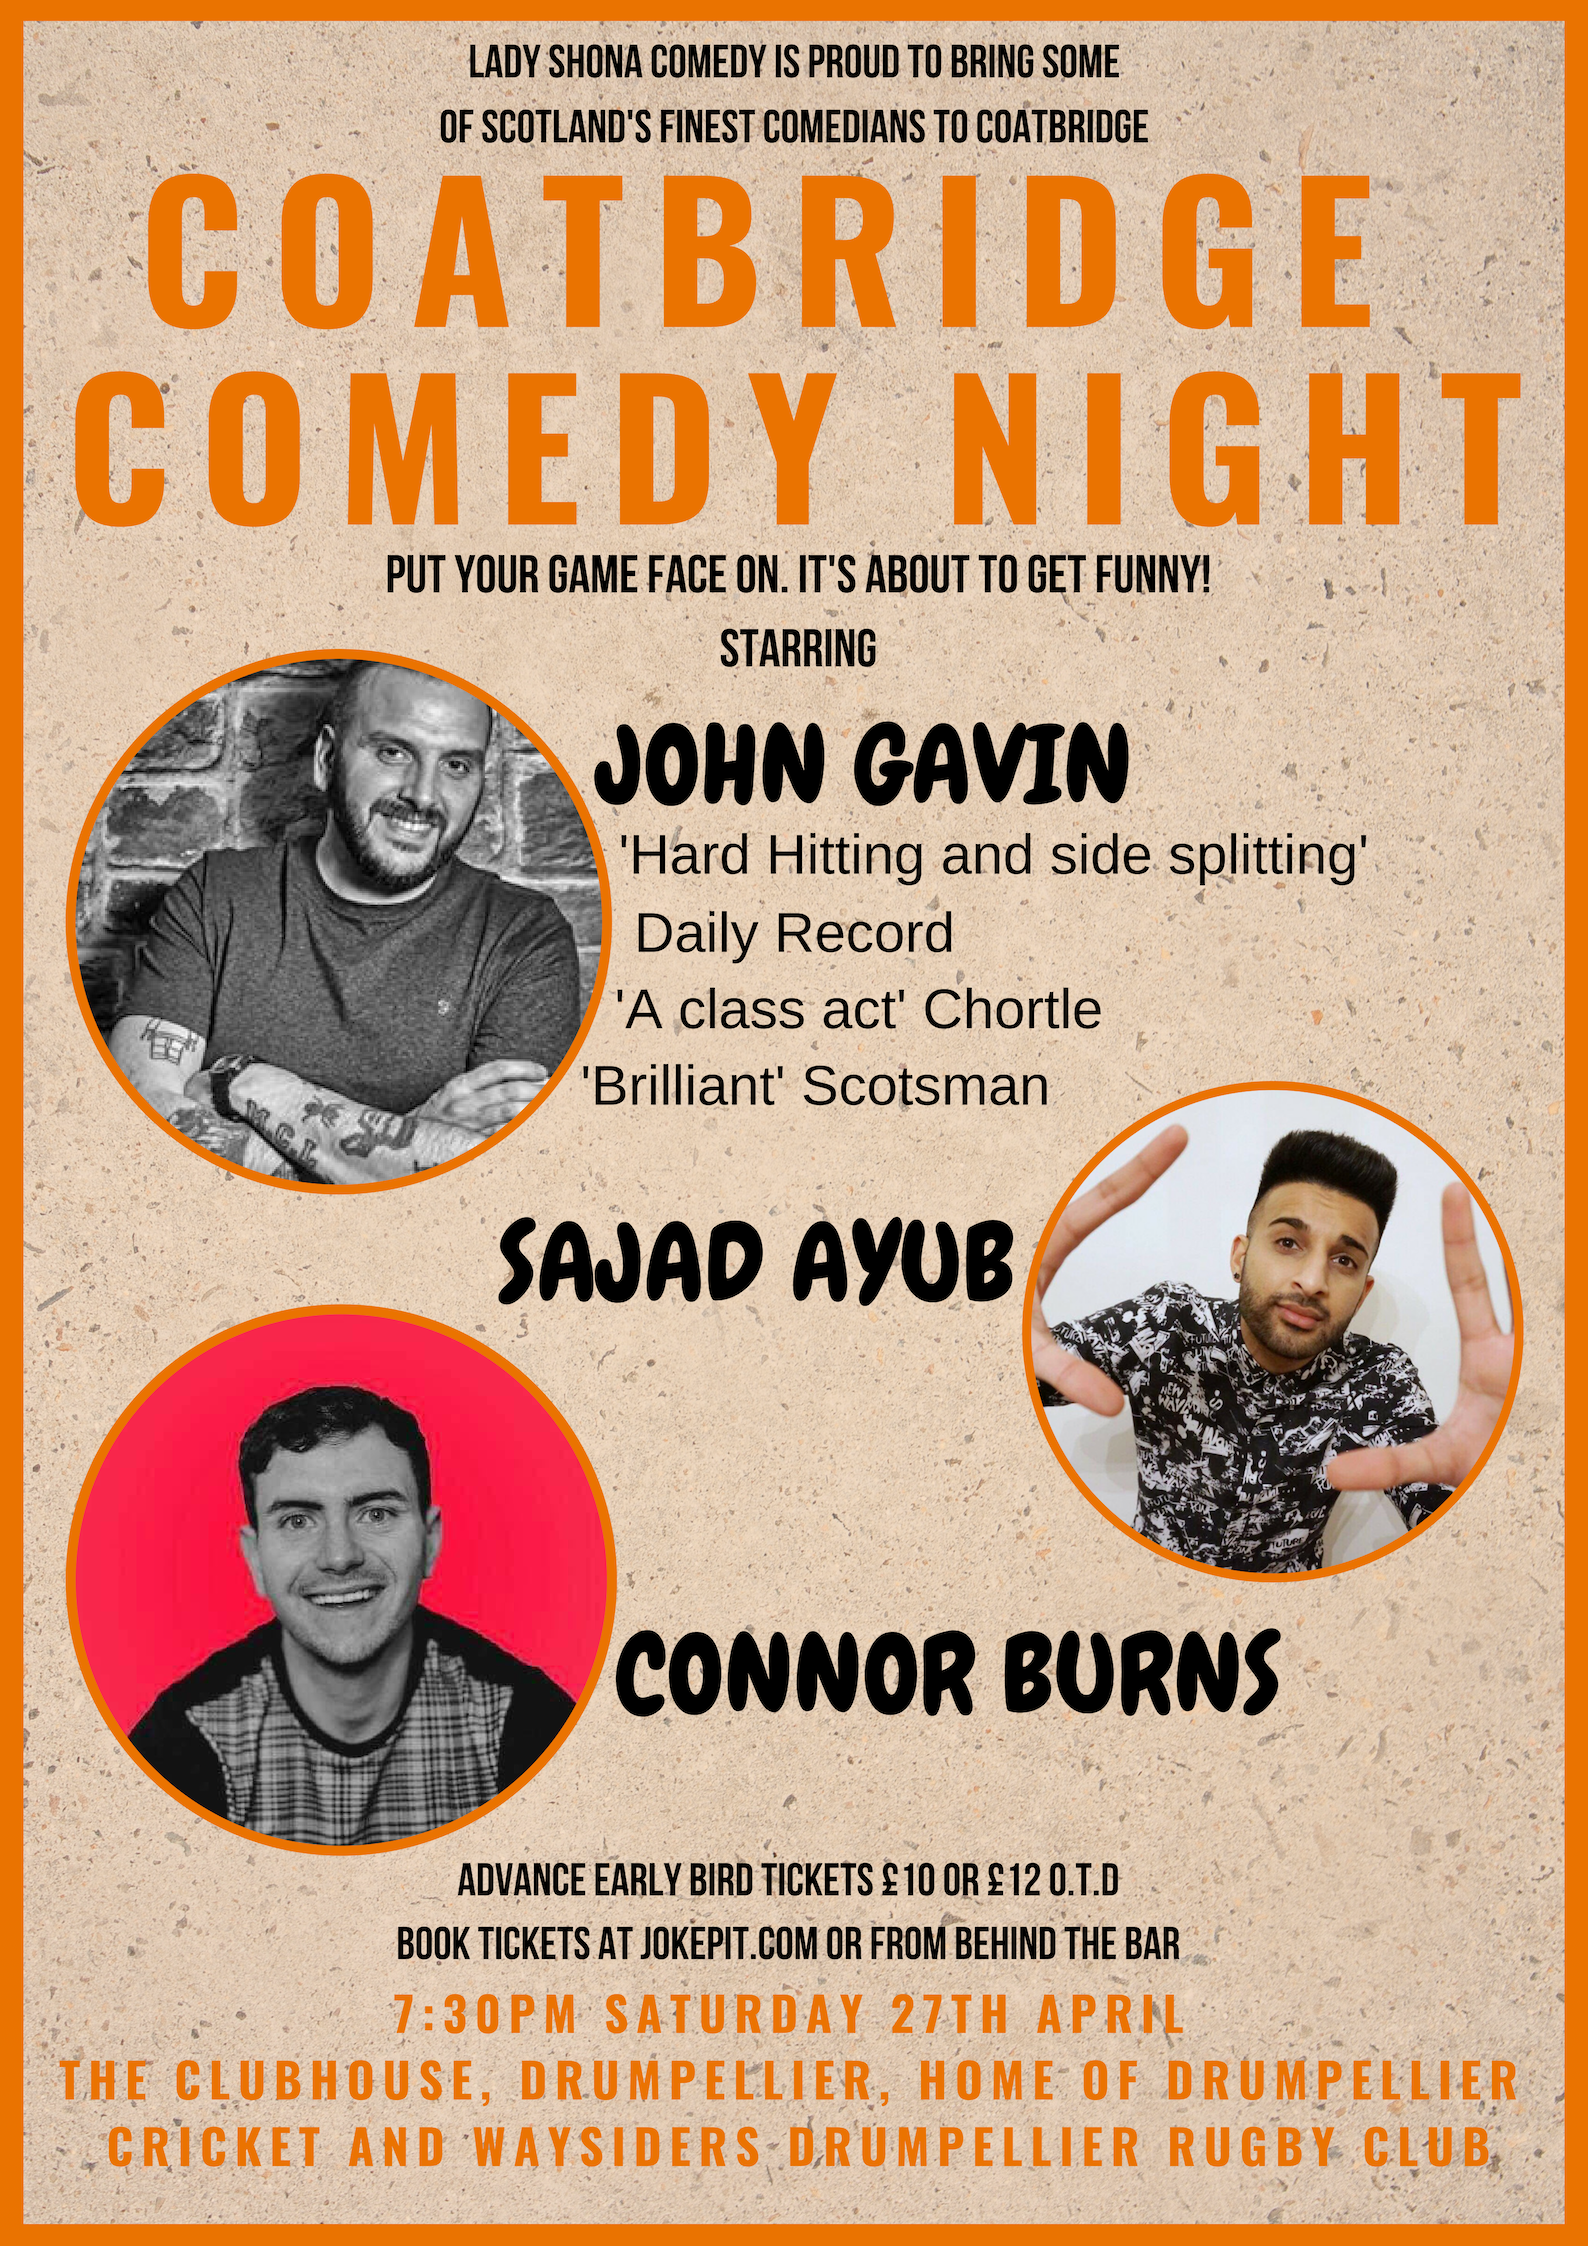 Coatbridge comedy night 27th april  1